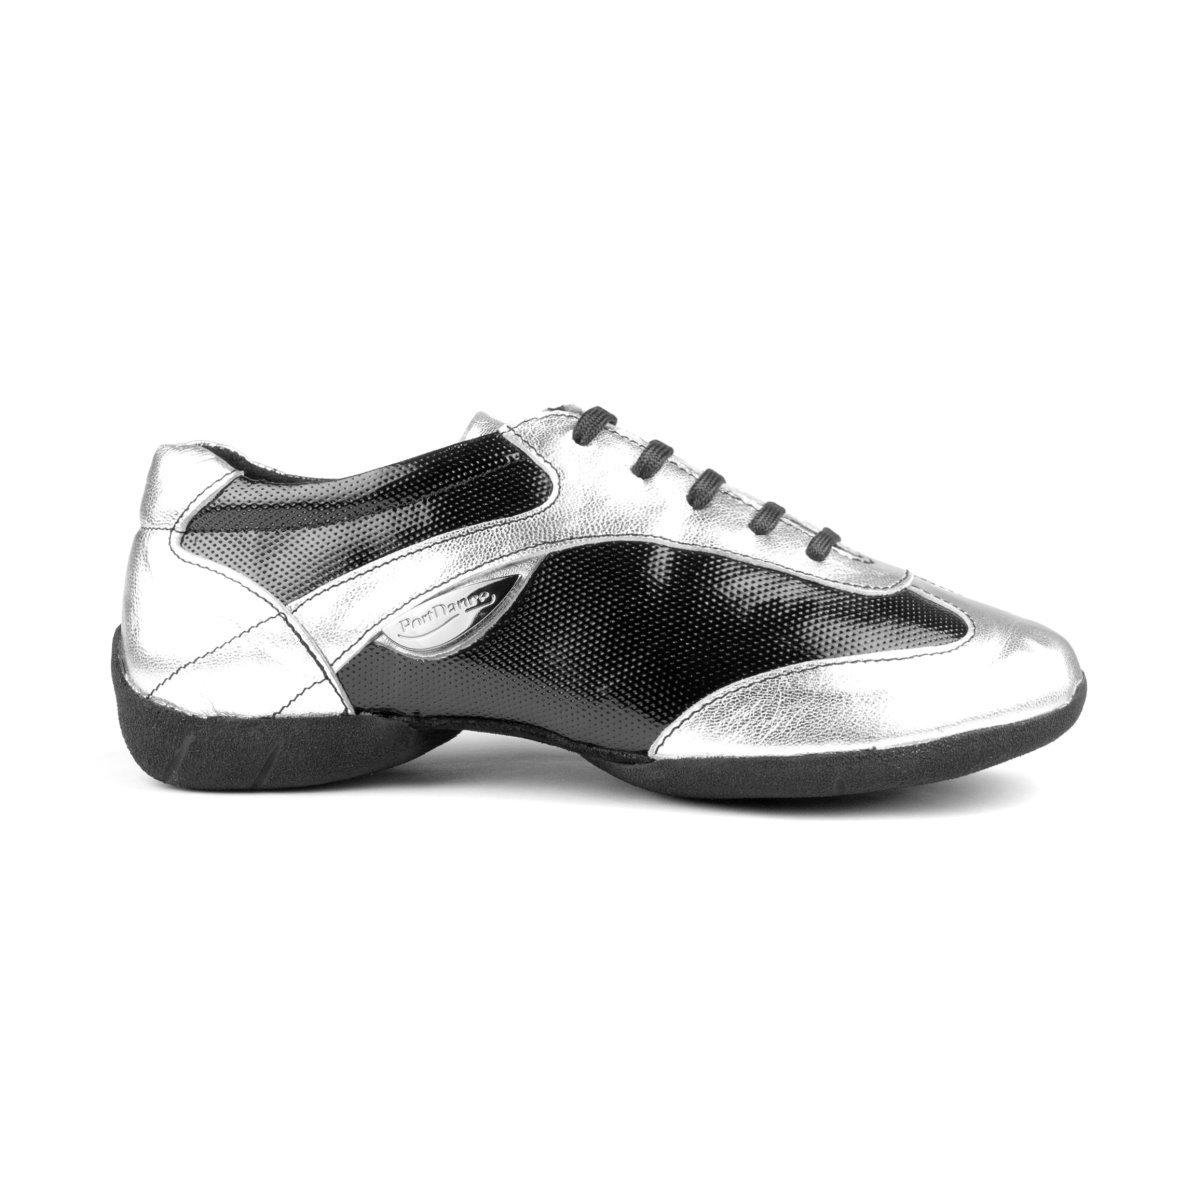 Cuir Noir//Argent Sneaker-Sole Portdance Femmes Dance Sneakers PD06